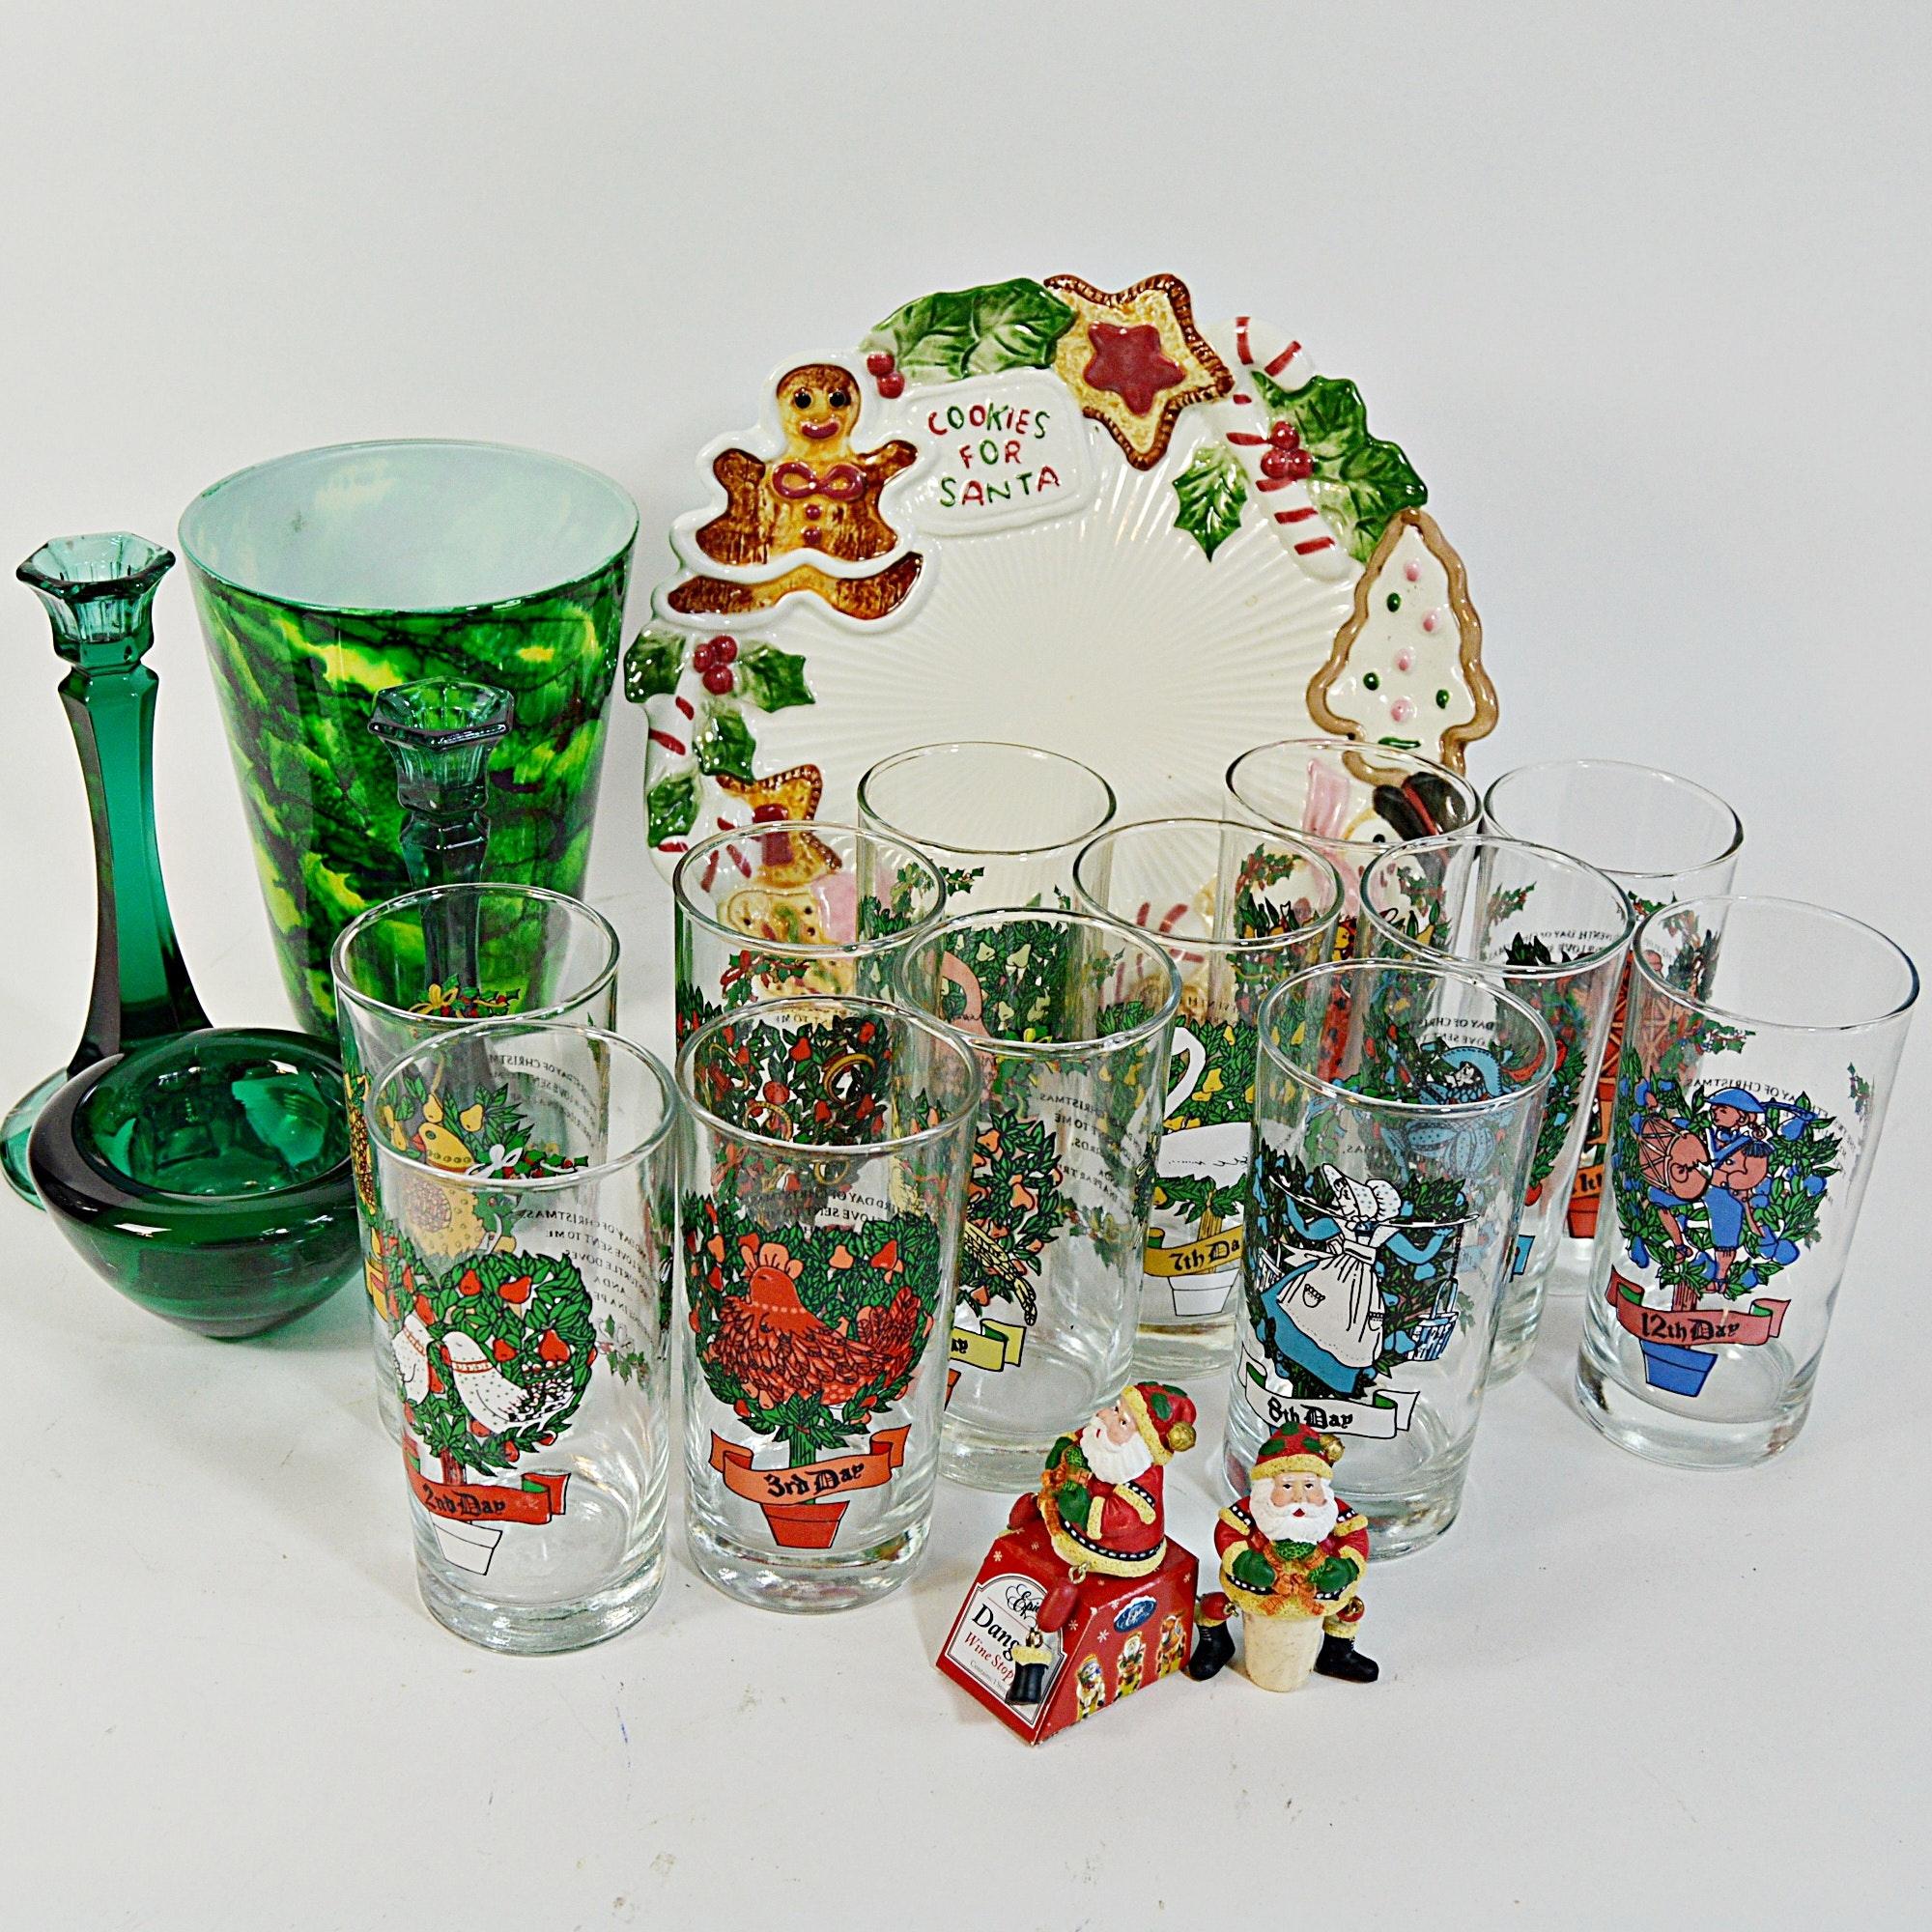 Christmas Glassware Set, Tableware and Vases